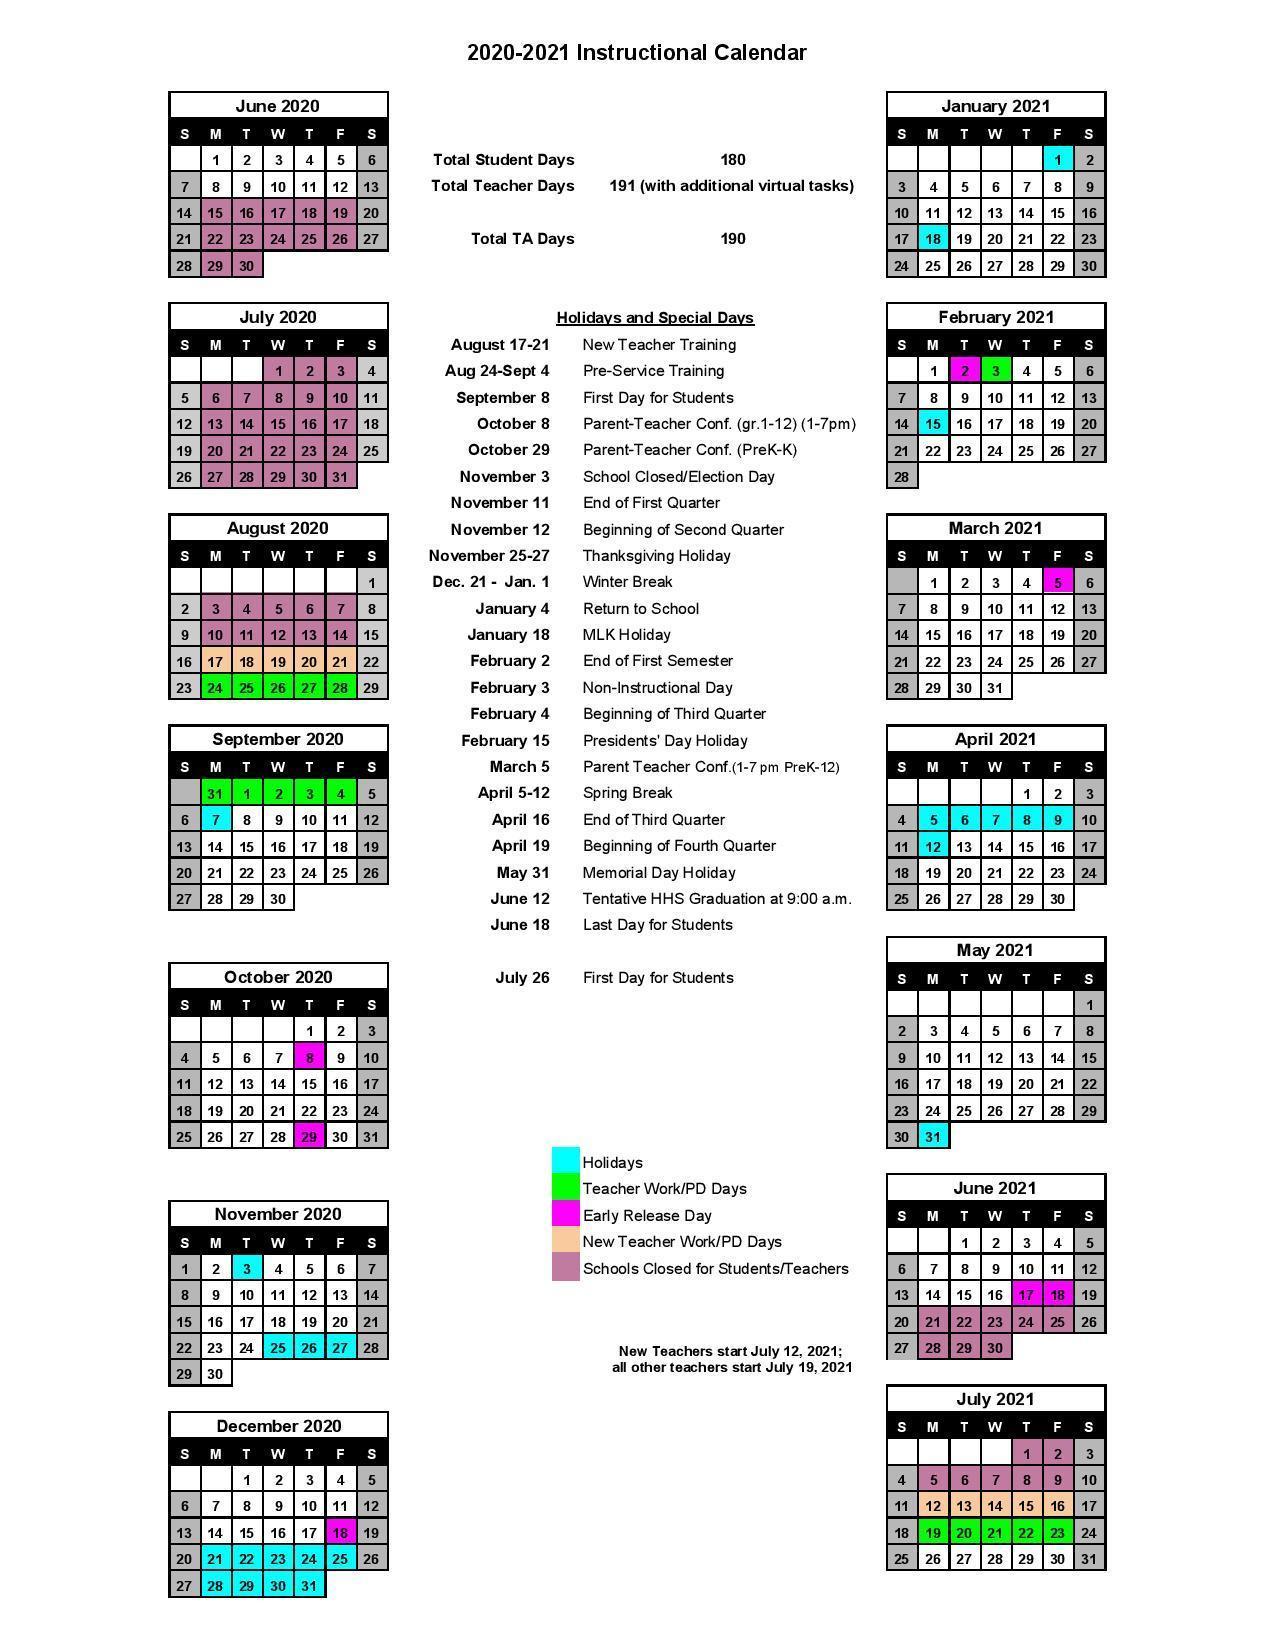 Academy 1 Jersey City Public School Calendar   Printable For Las Cruces Public School Calendar 2021